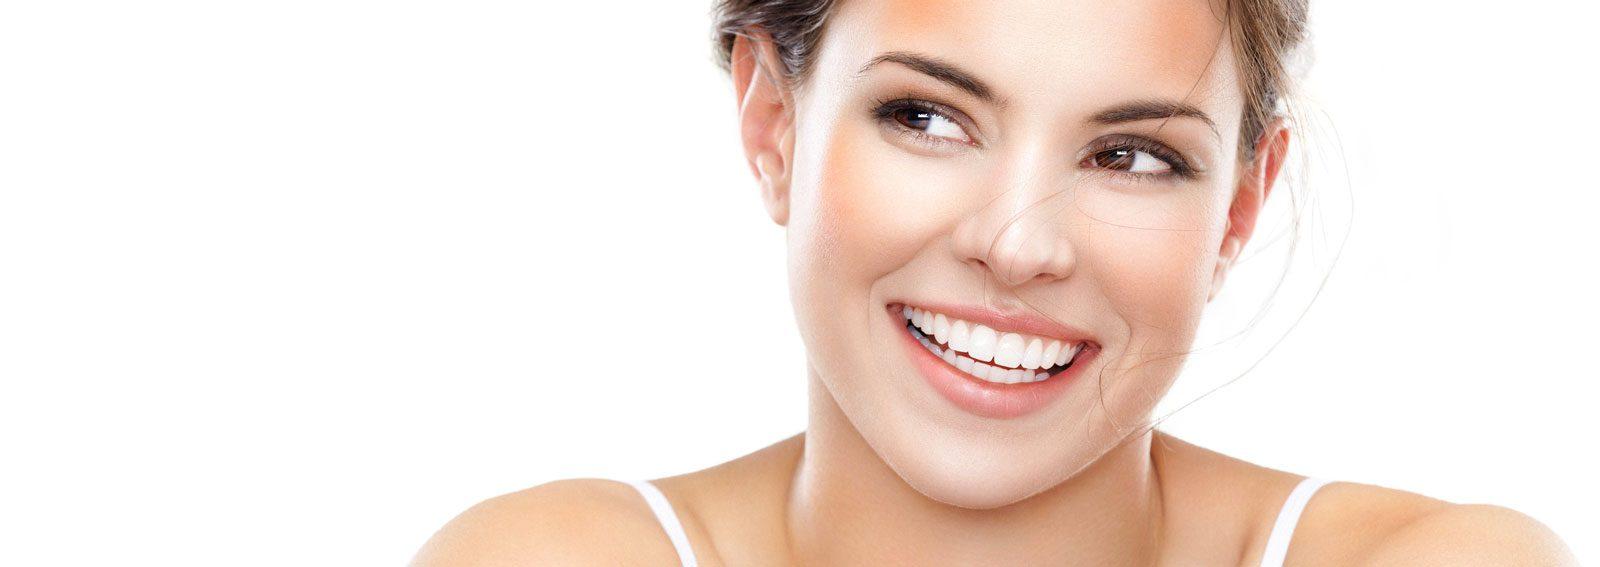 odontología cosmética vs estética dental